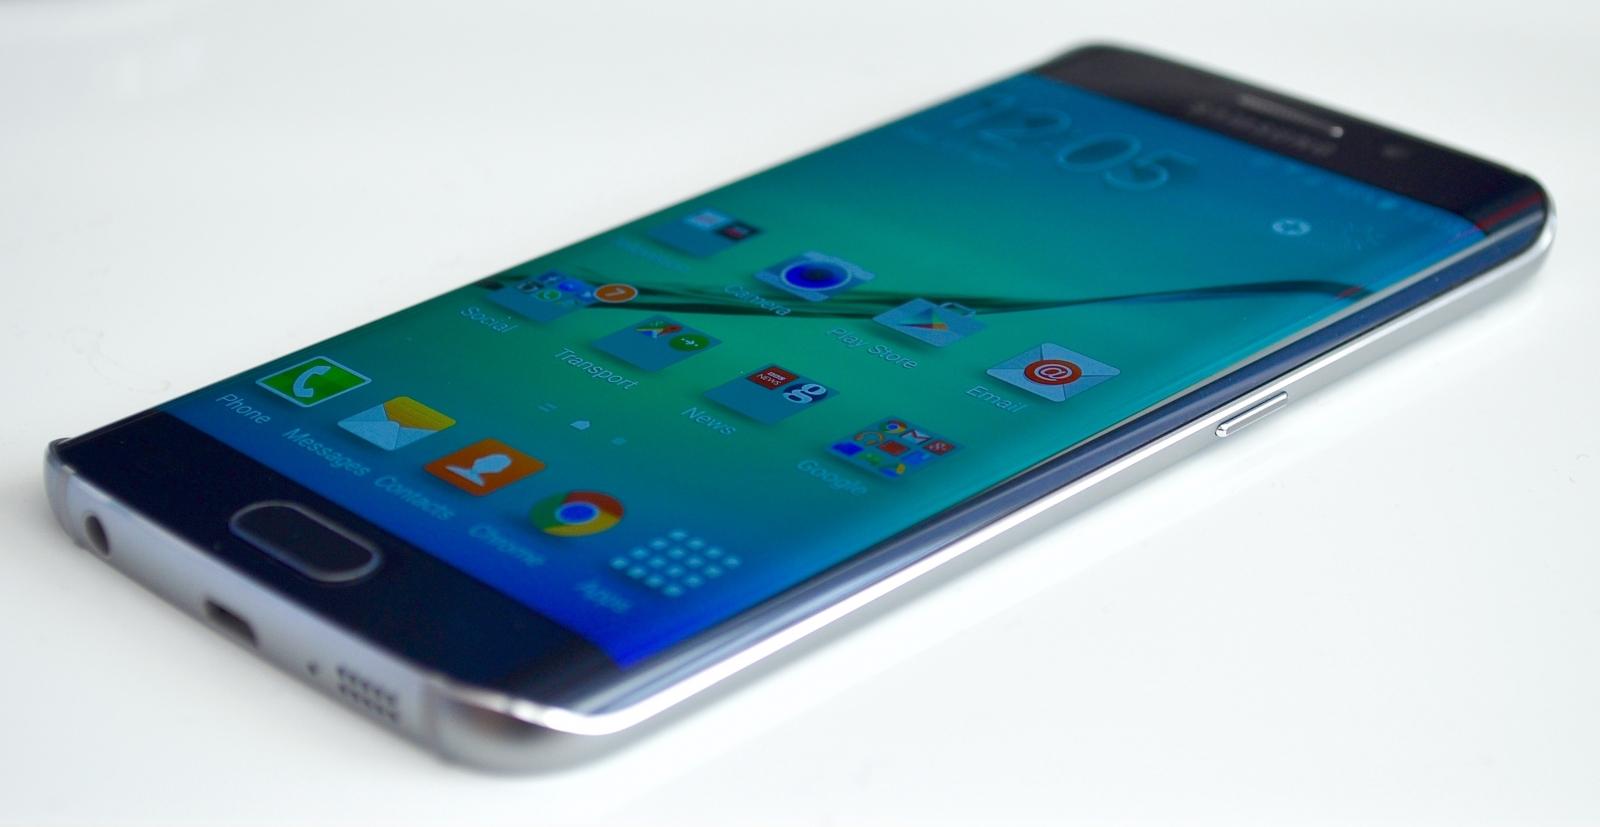 Samsung Galaxy S6 Edge Review: Samsung Gets Its Mojo Back